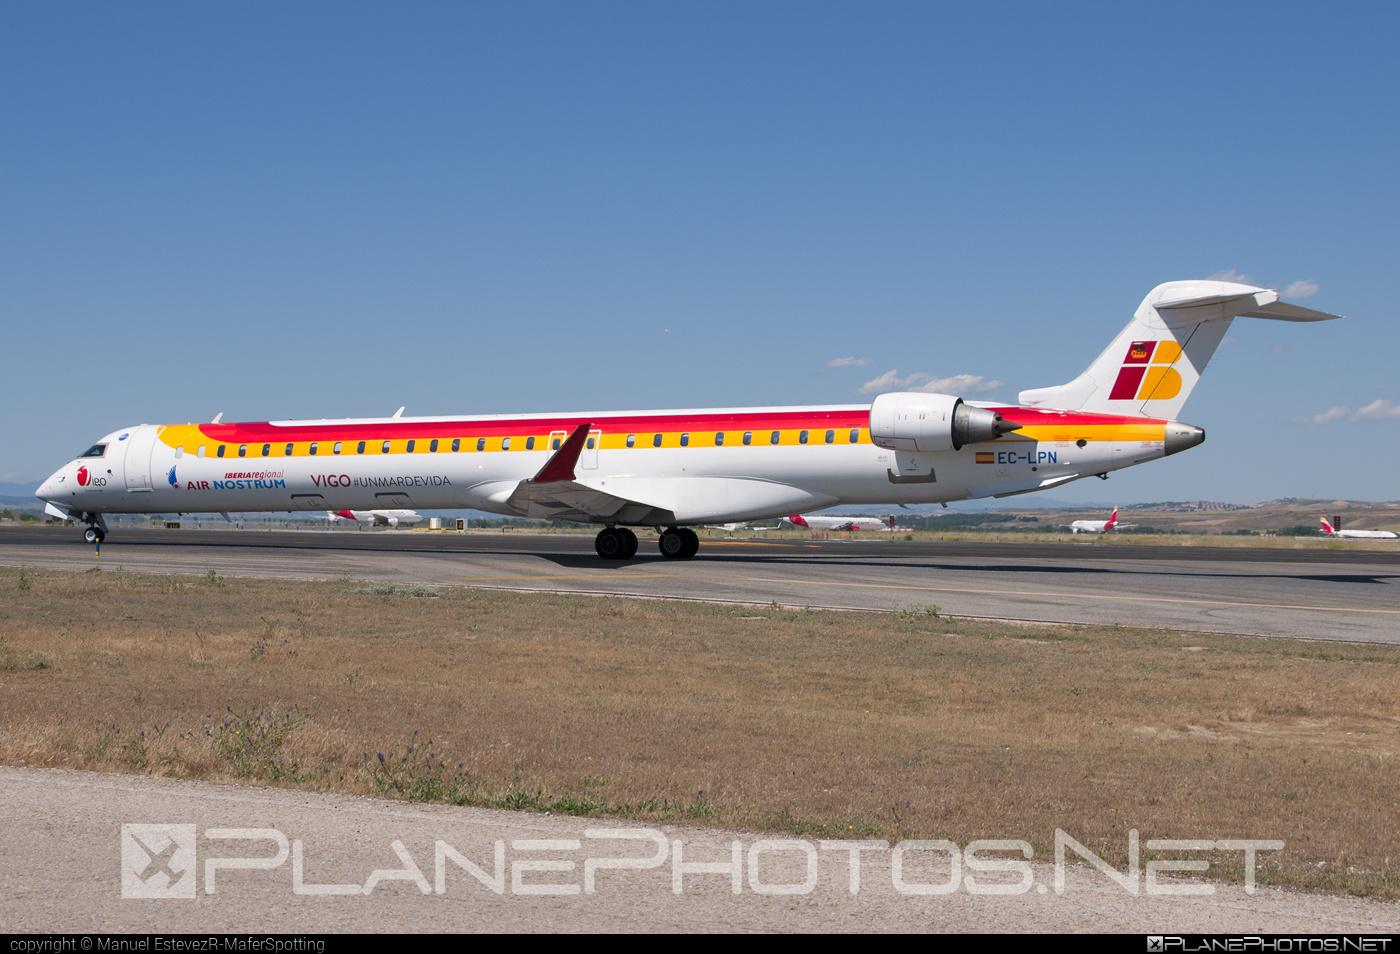 Bombardier CRJ1000 NextGen - EC-LPN operated by Iberia Regional (Air Nostrum) #airnostrum #bombardier #crj1000 #crj1000nextgen #crj1000ng #iberia #iberiaregional